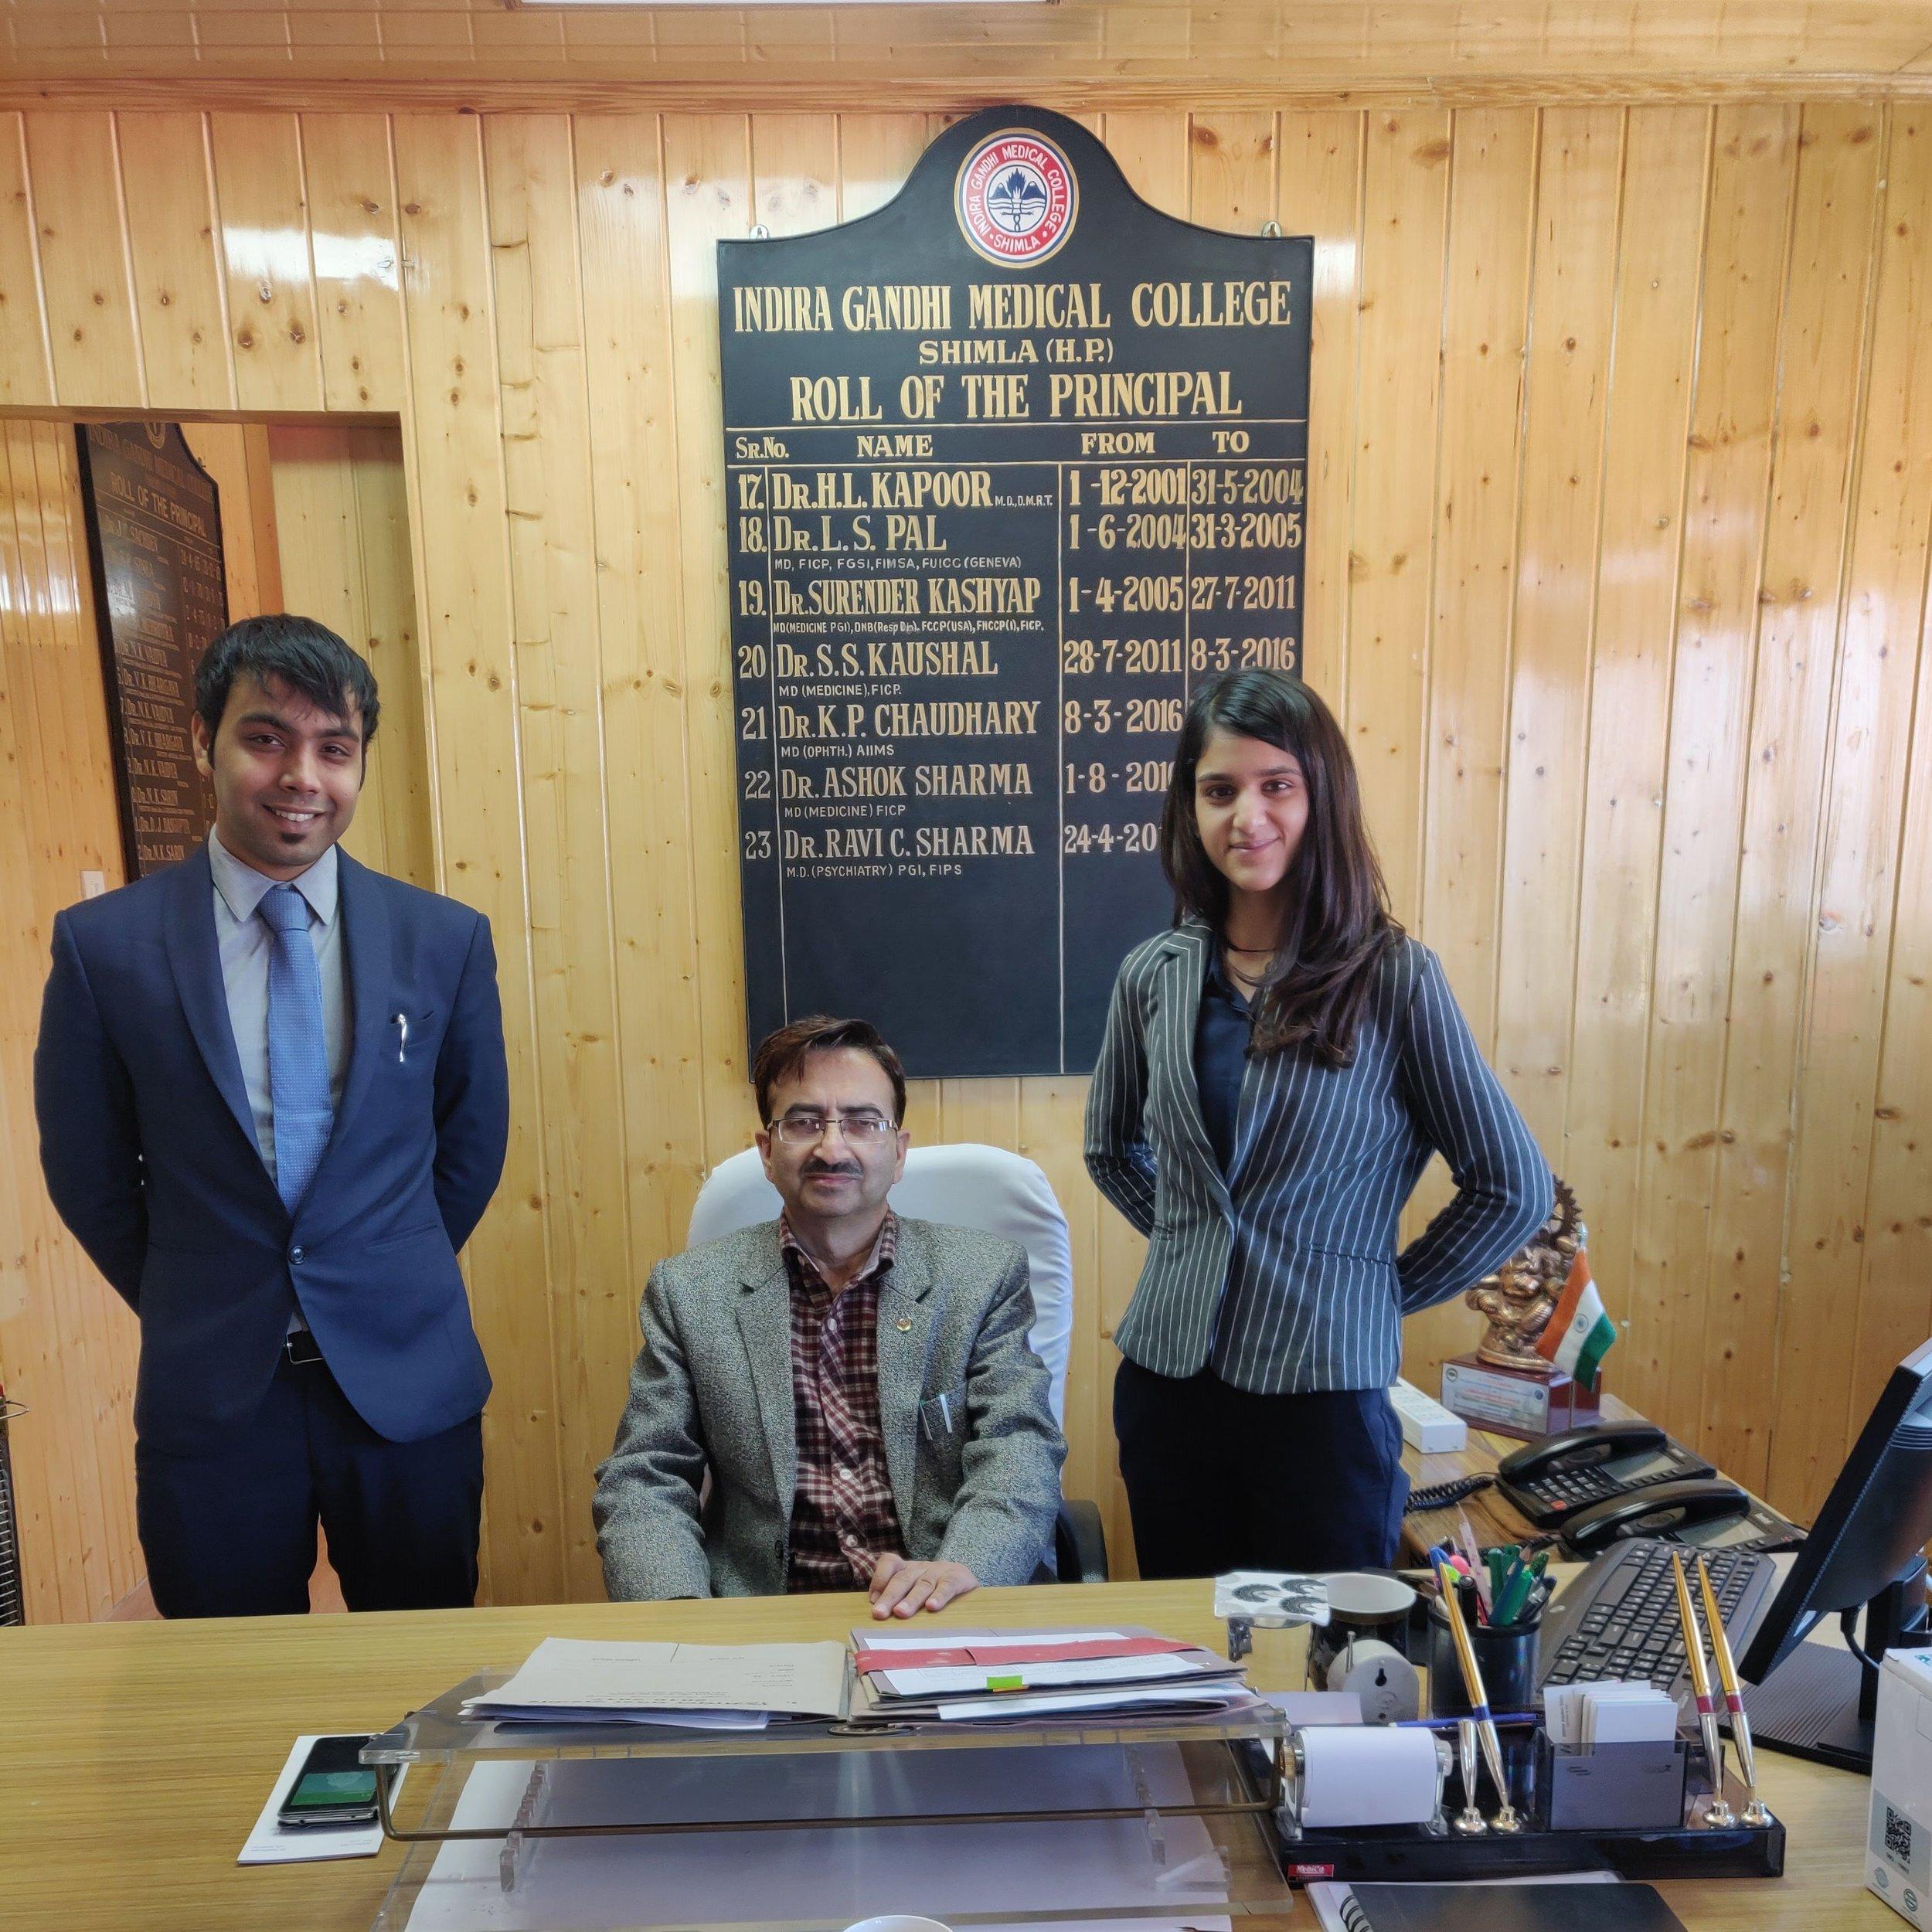 Meeting the Honourable Principle of the IGMC, Shimla, Himachal Pradesh. (2018)